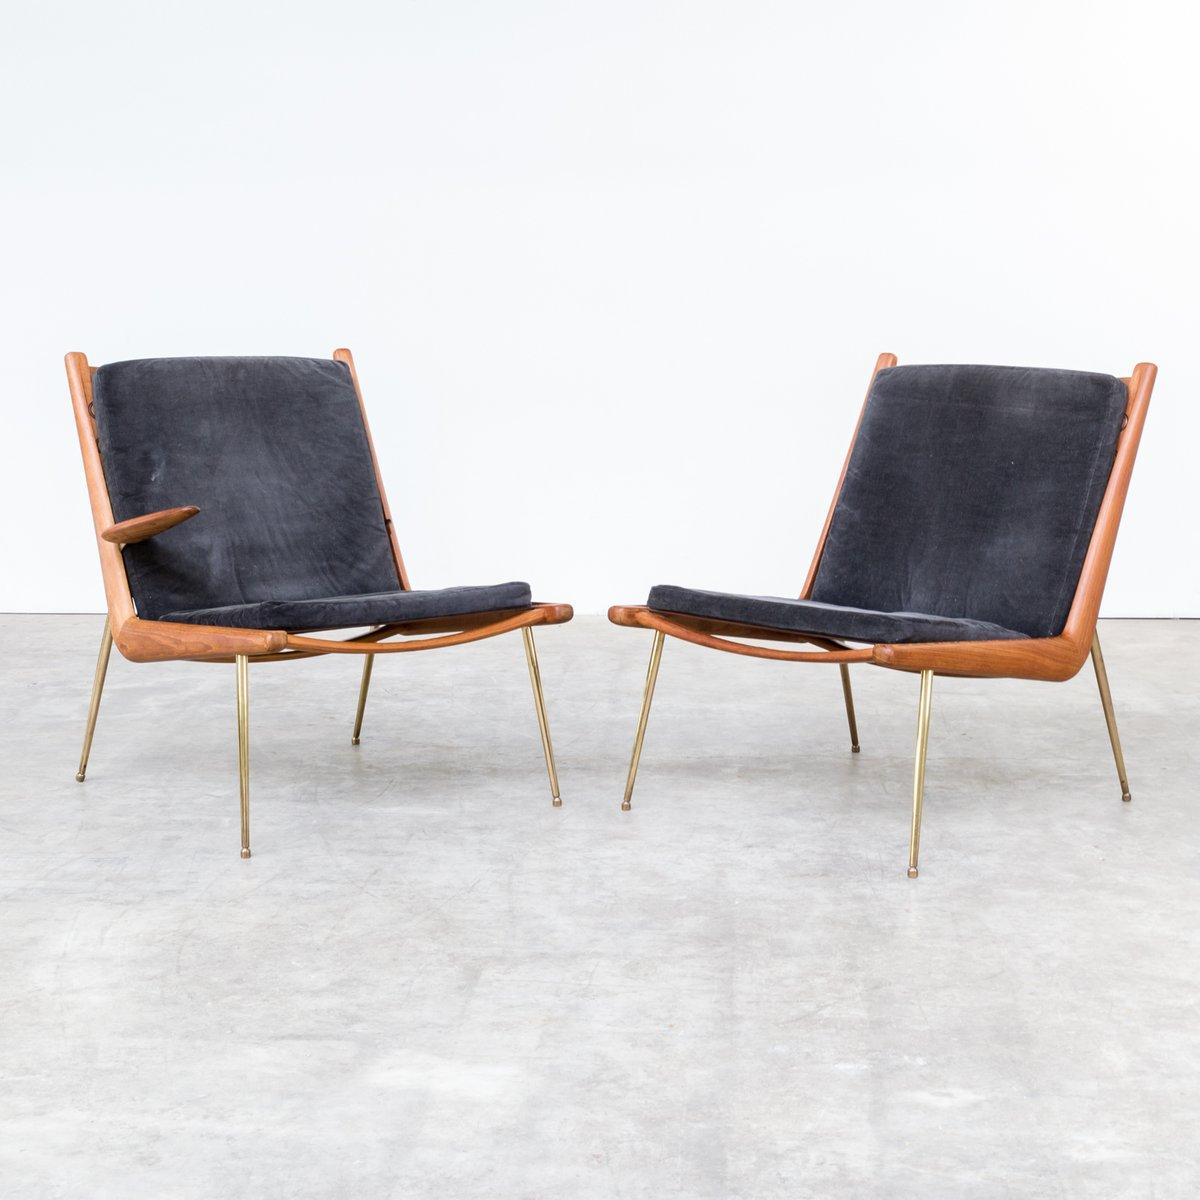 Boomerang Fd135 Chairs By Peter Hvidt Orla M Lgaard